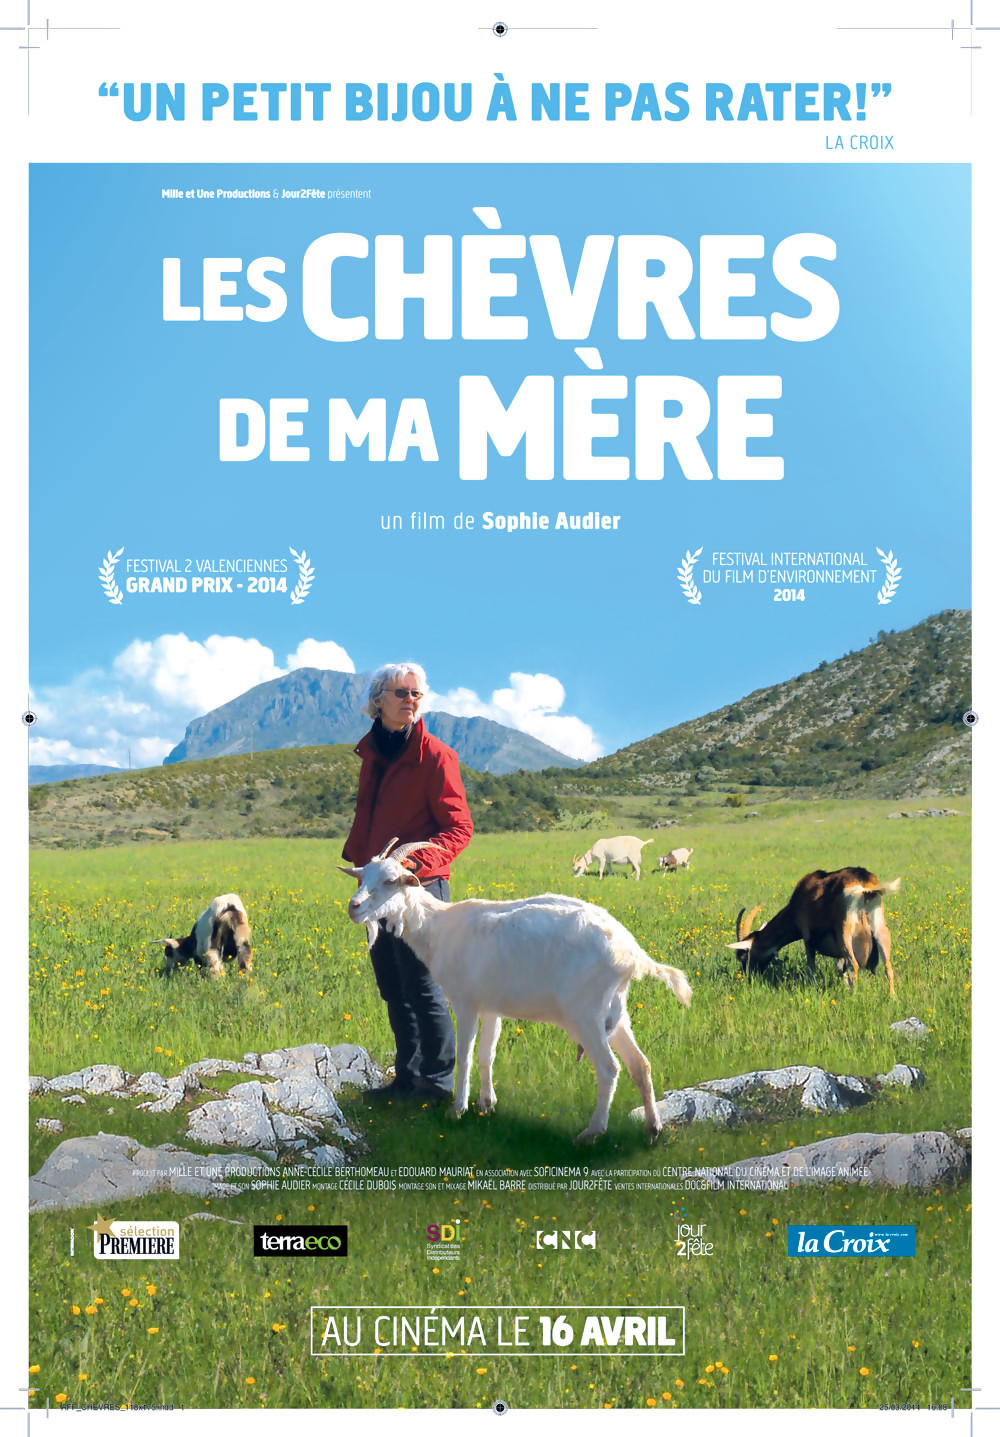 Sortie du documentaire LES CHEVRES DE MA MERE   Utopia 16 avril